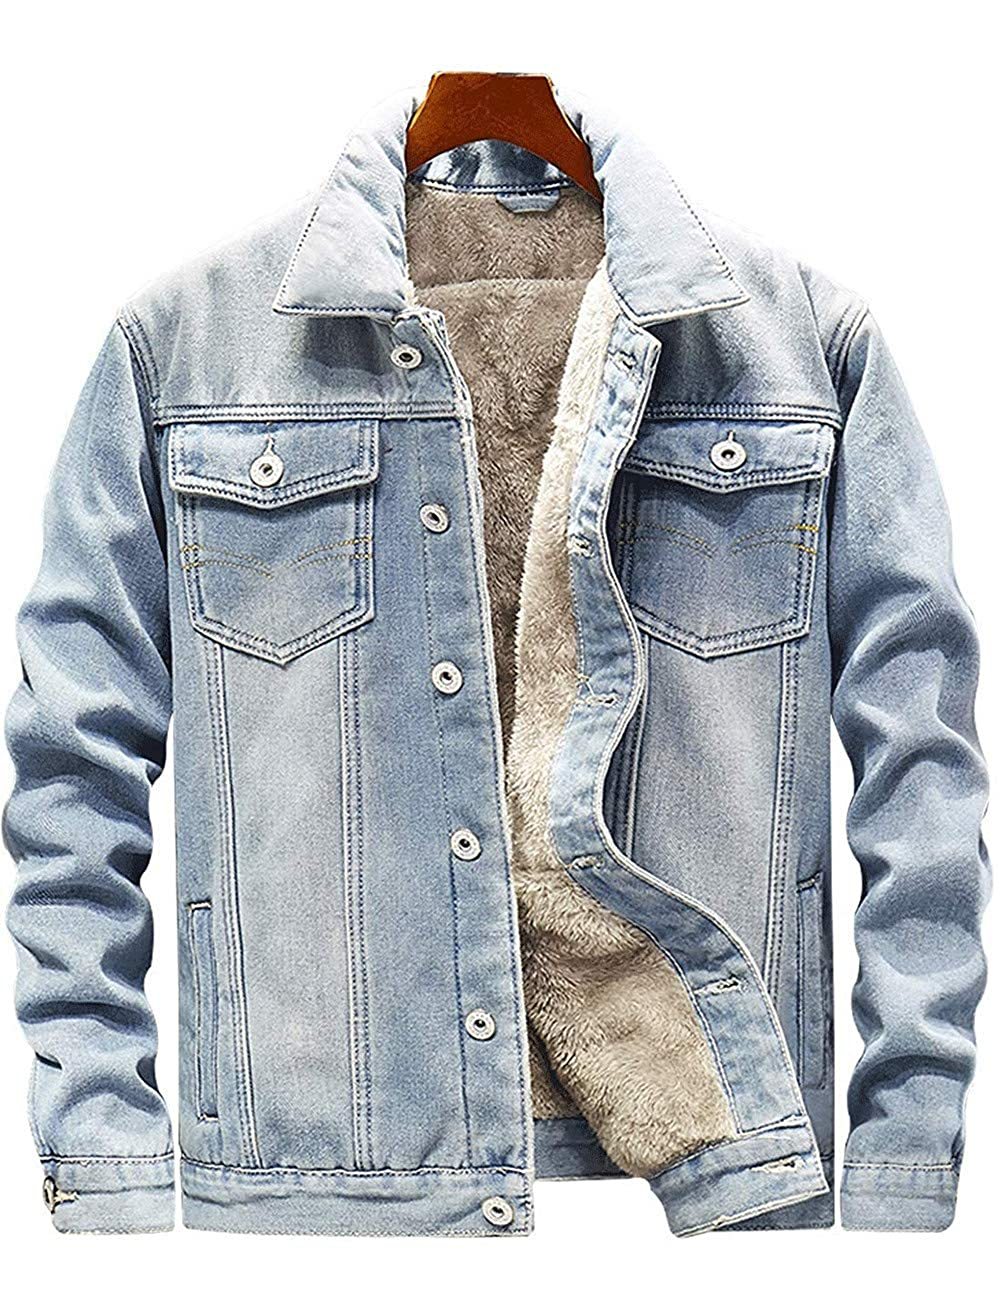 e74b7c936a37 Lightblueee Zhdyhgsd Men's Loose Loose Loose Button Down Fleece Lined Thick  Denim Jean Trucker Jacket d50680